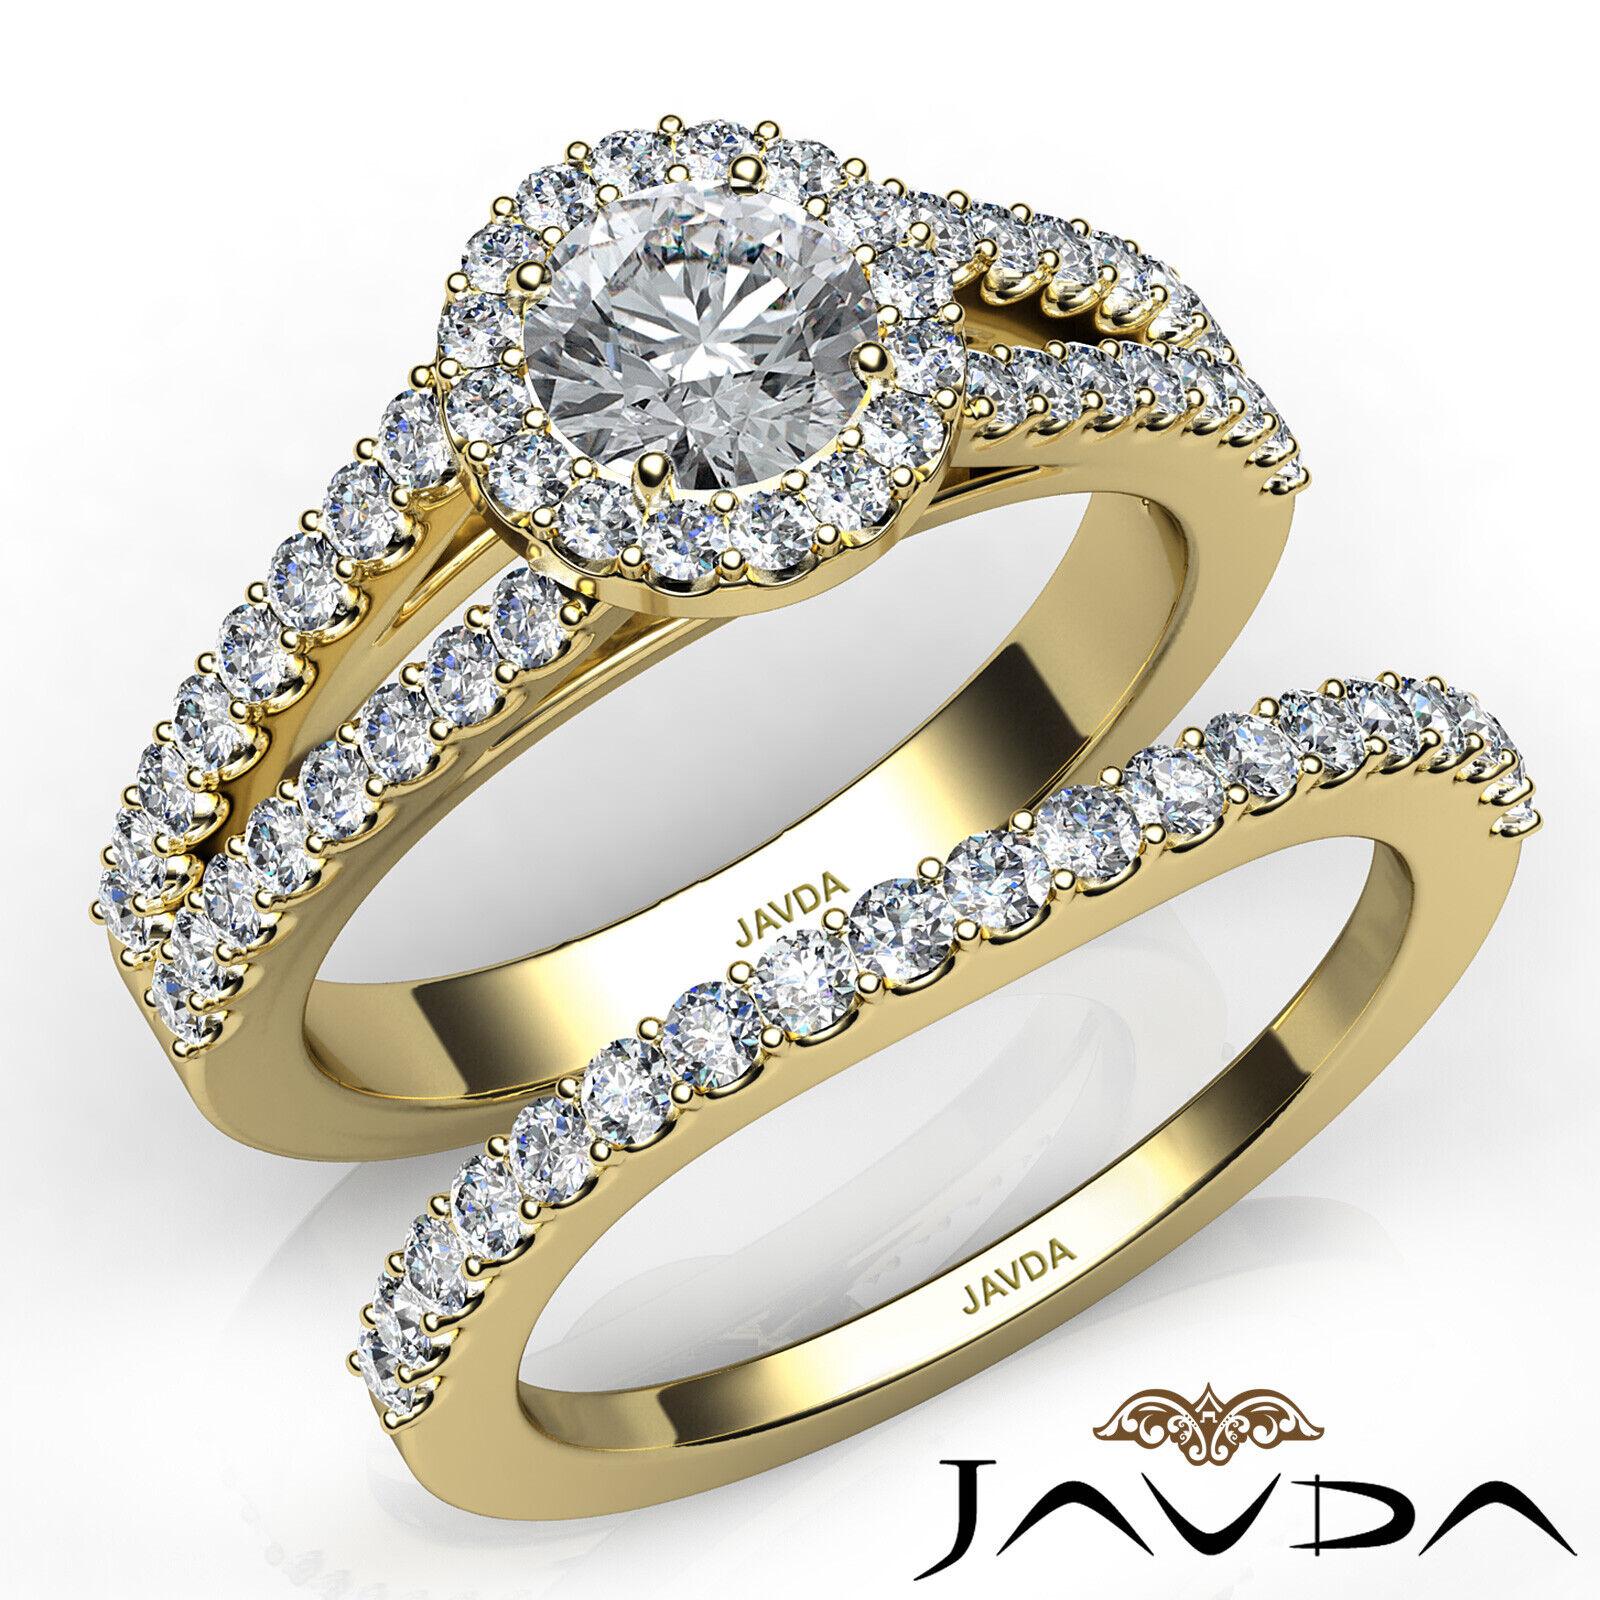 1.85ctw Luxurious Wedding Bridal Round Diamond Engagement Ring GIA G-VVS1 W Gold 8